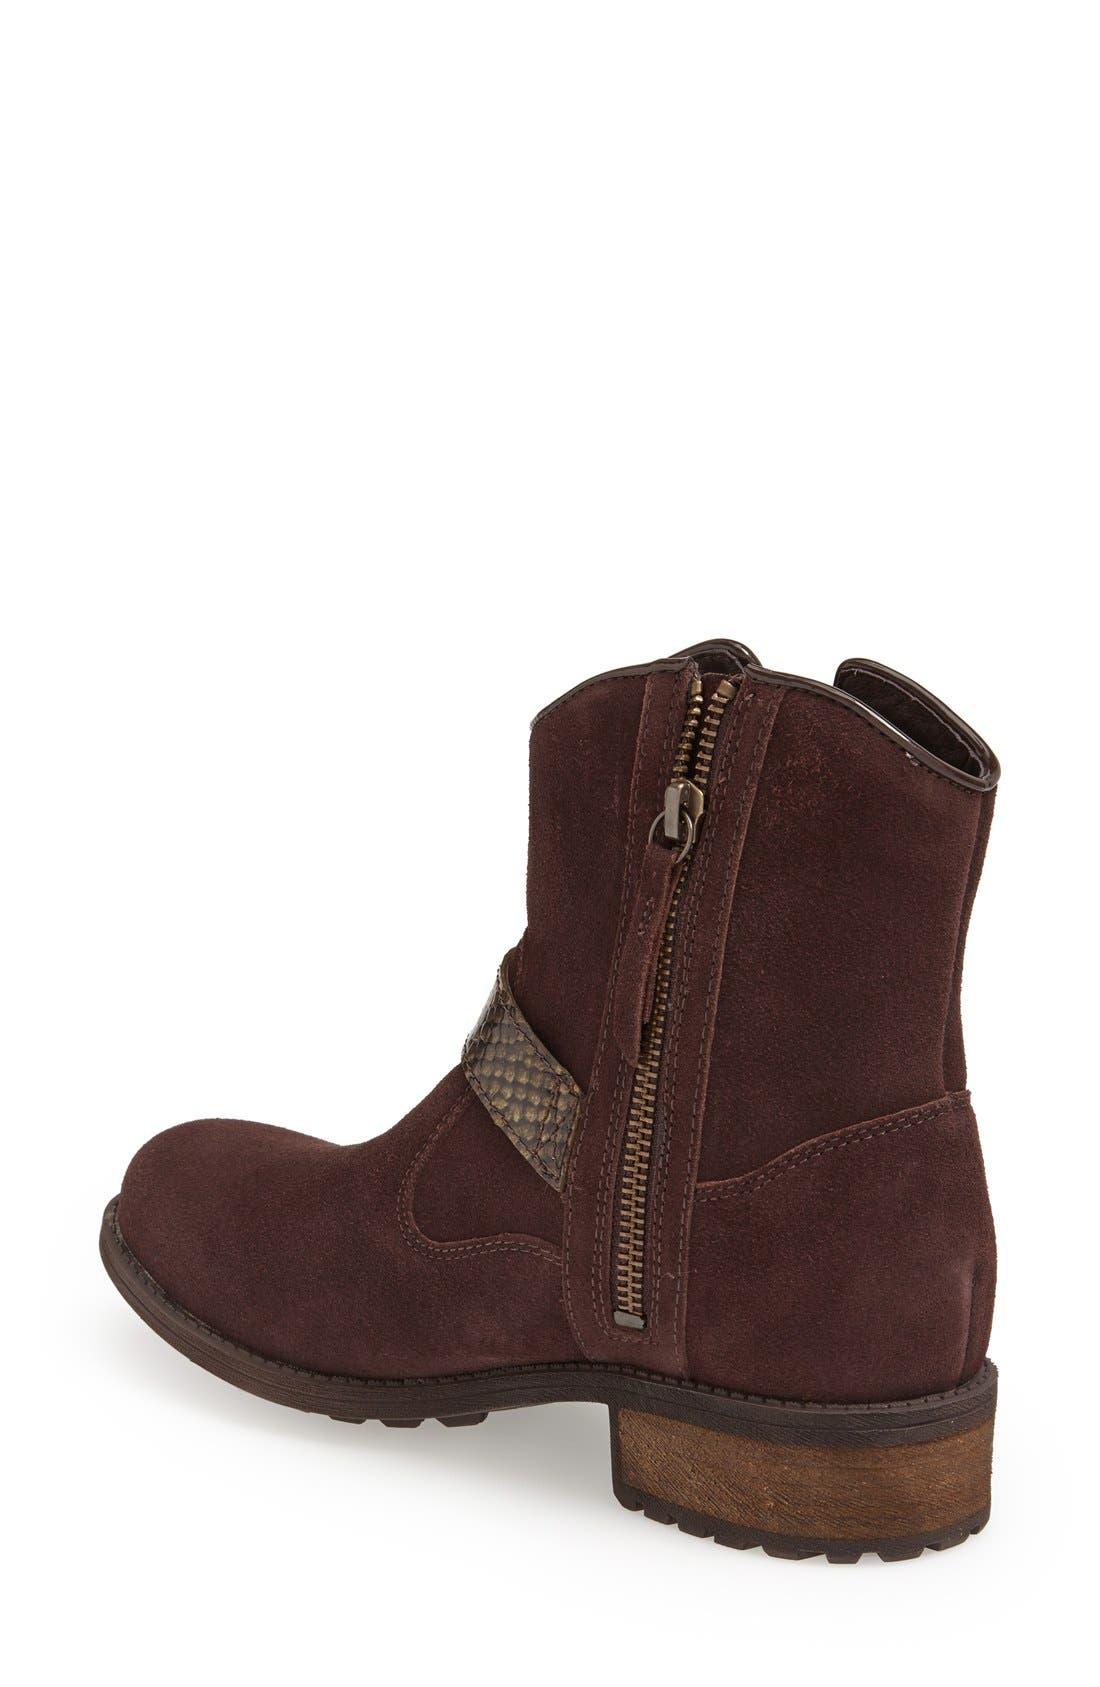 Alternate Image 2  - UGG® Australia 'Milnor' Belted Boot (Women)